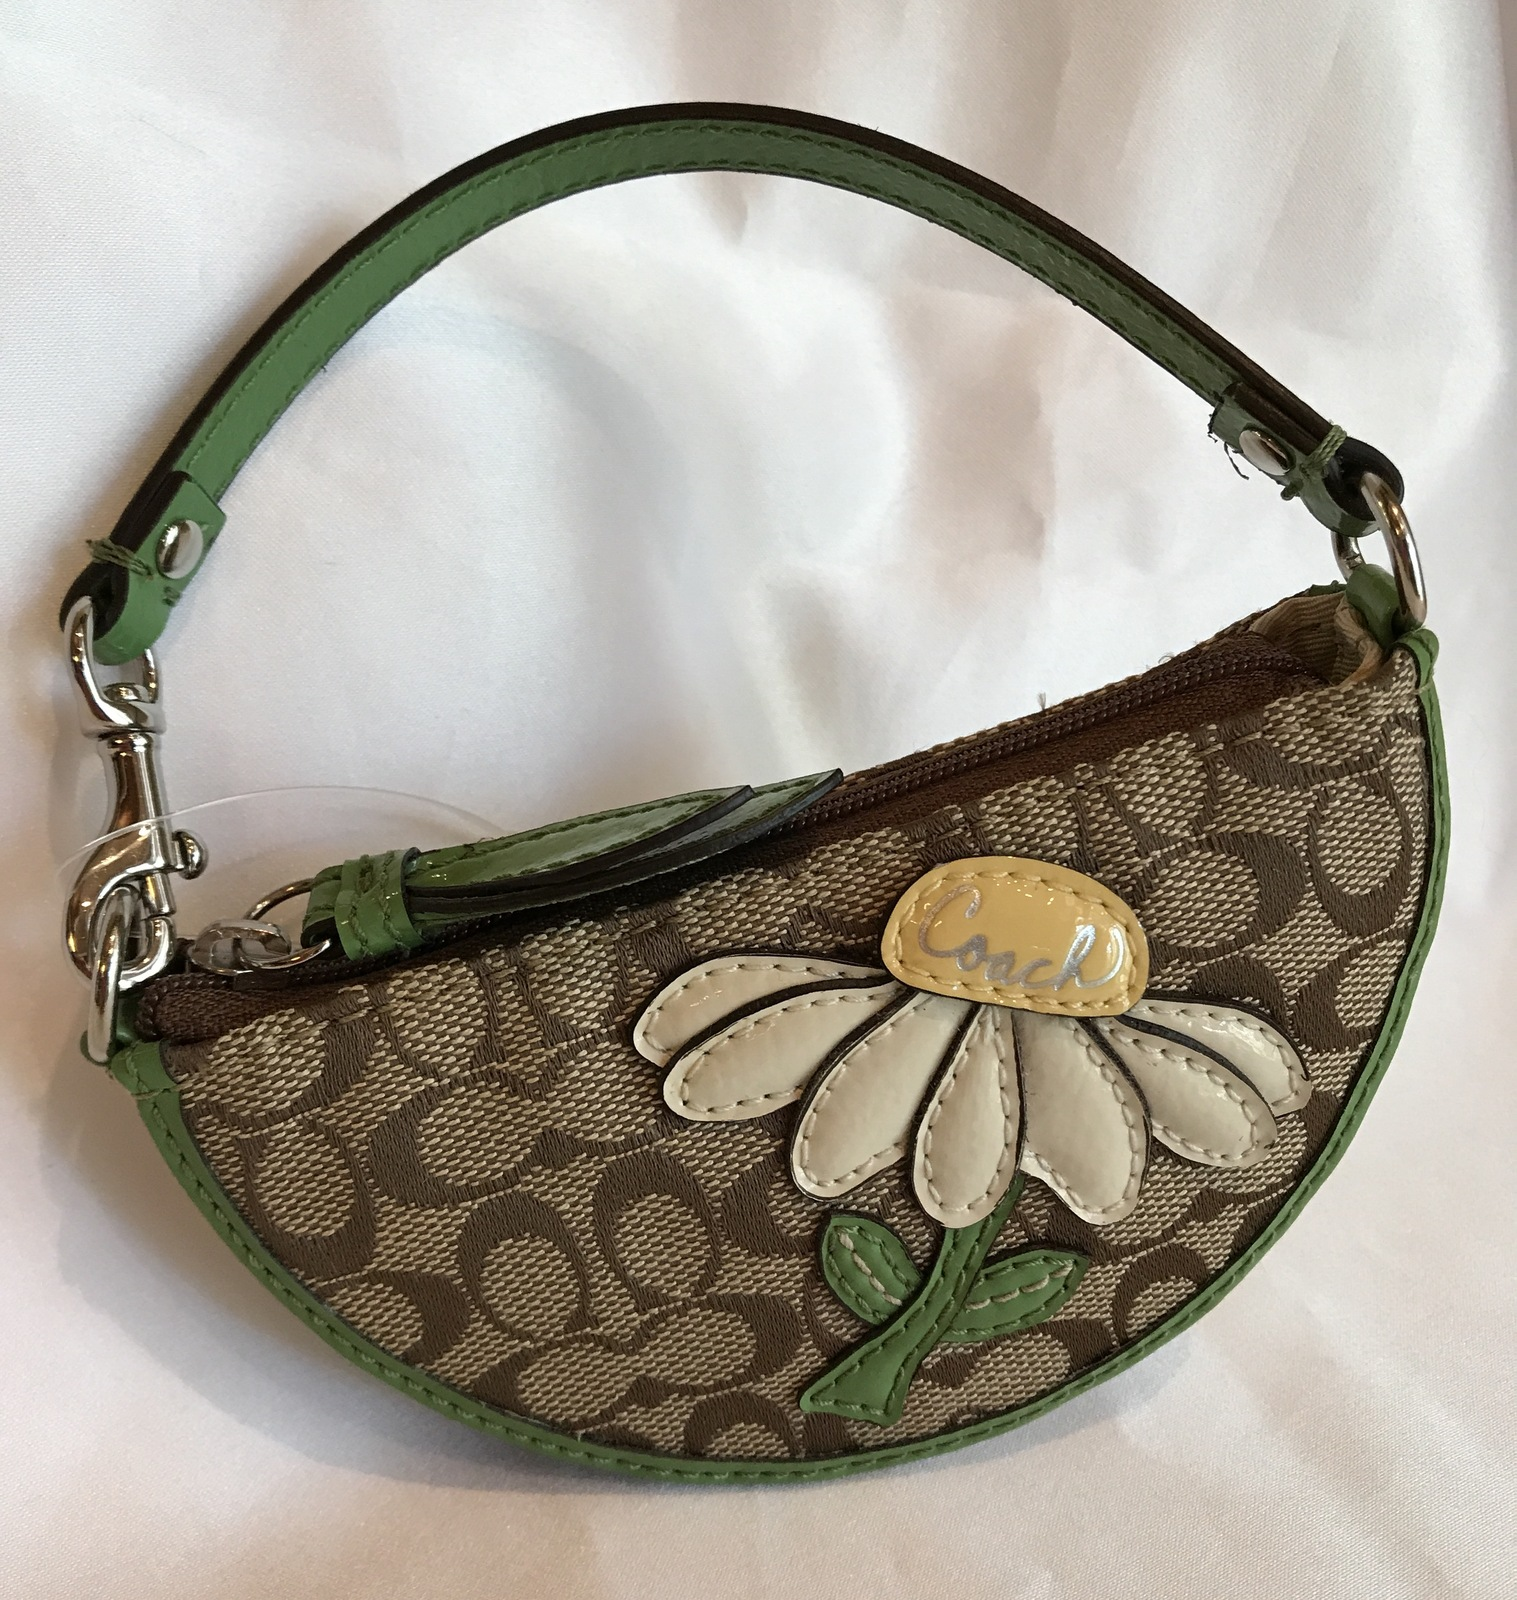 2aa02f1415 Coach Daisy Motif Coin purse Small Wristlet NWT -  58.00